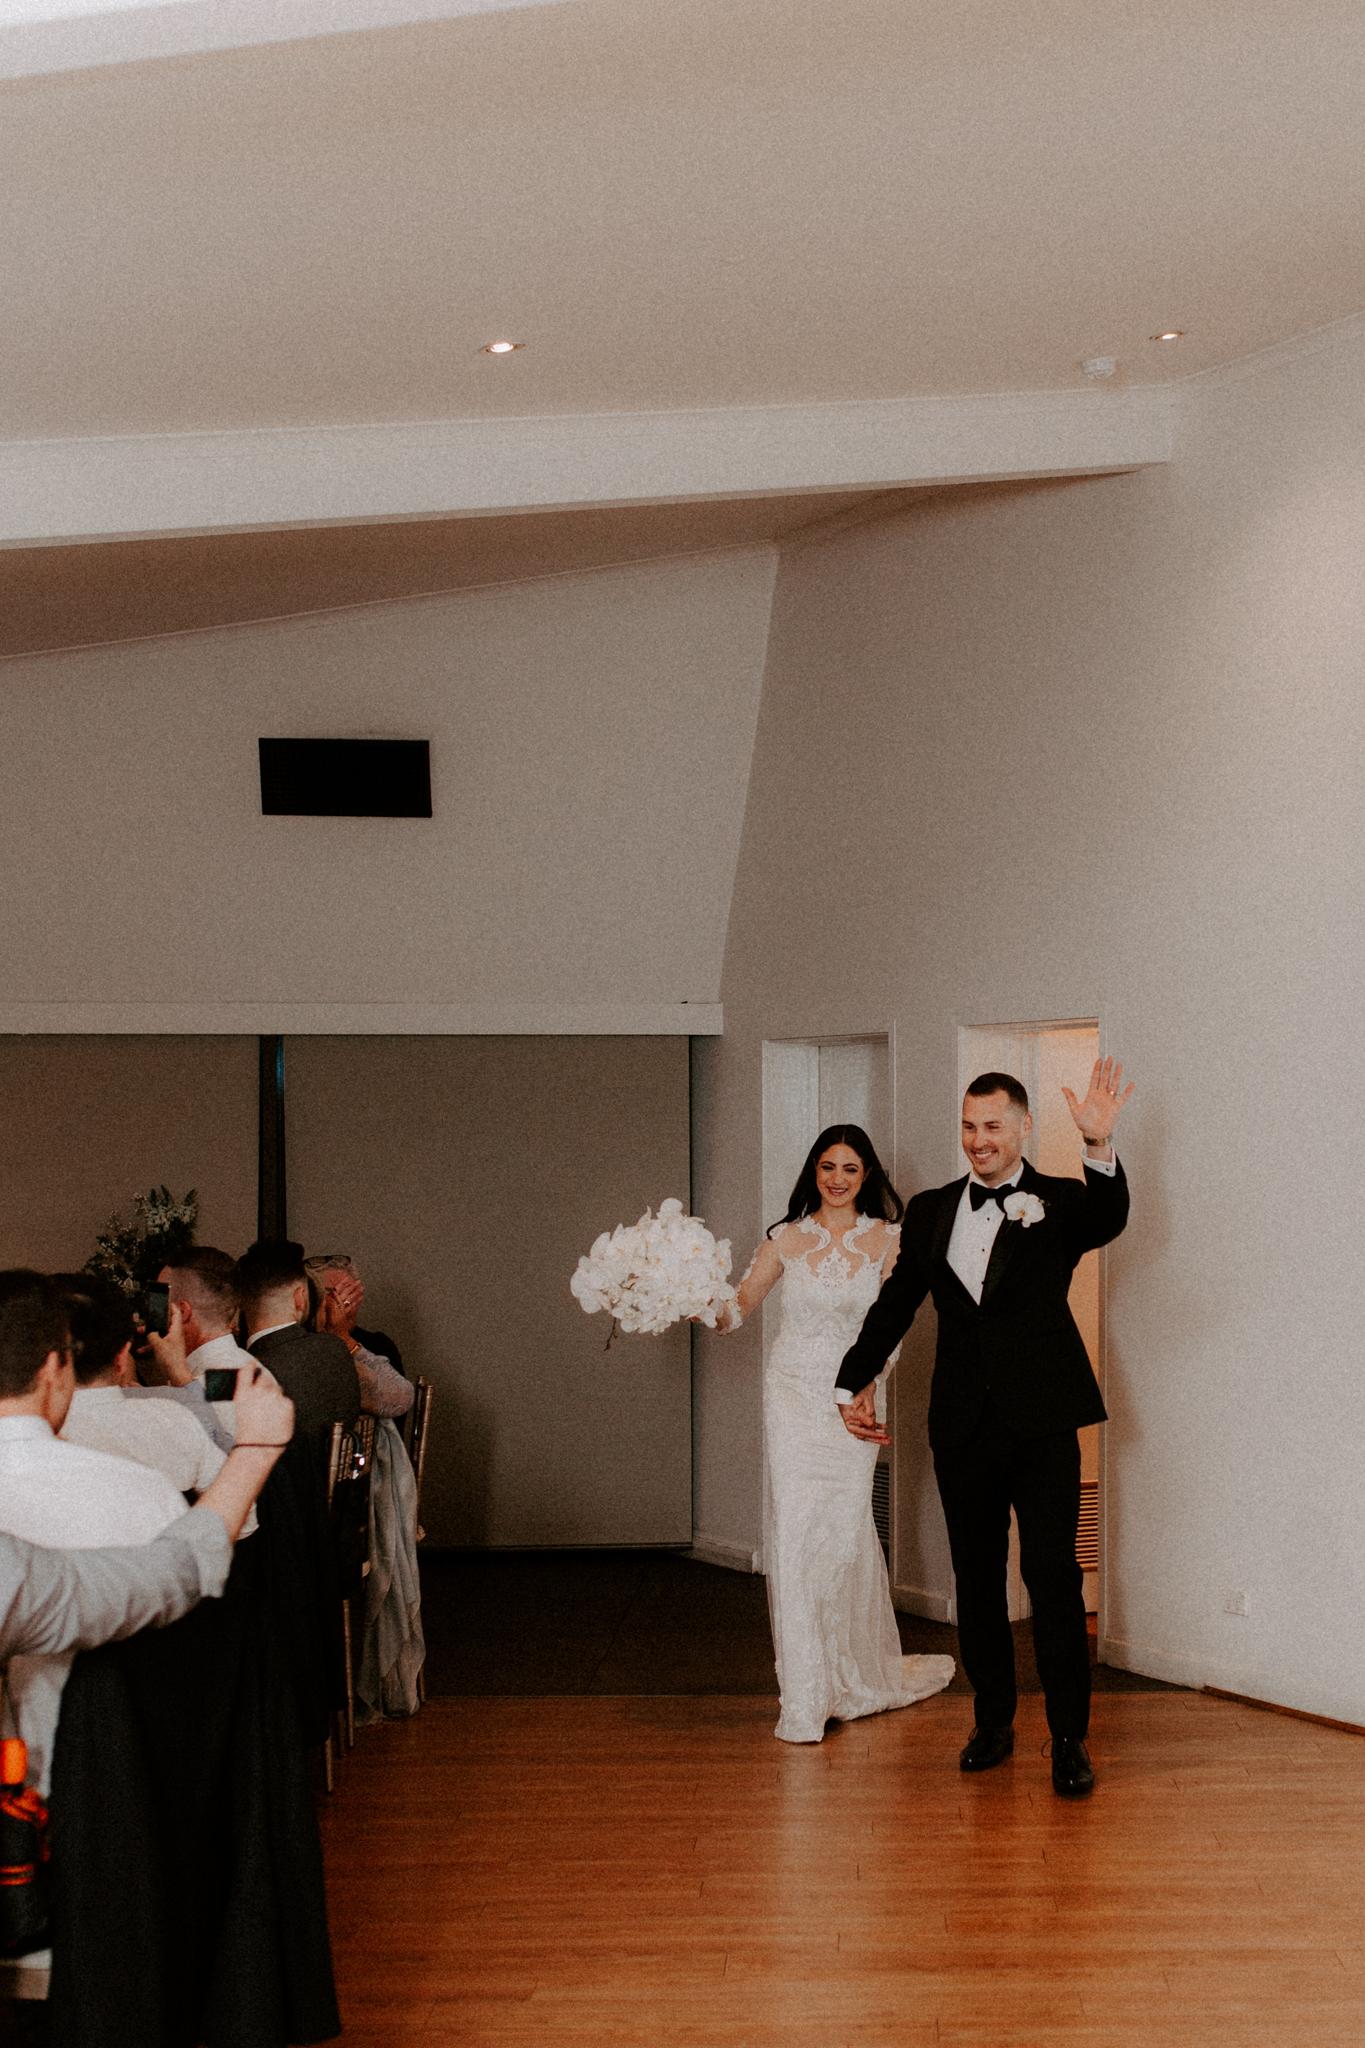 The-Terrace-Royal-Botanic-Gardens-Wedding-Emotions-and-Math-Photography-145.jpg